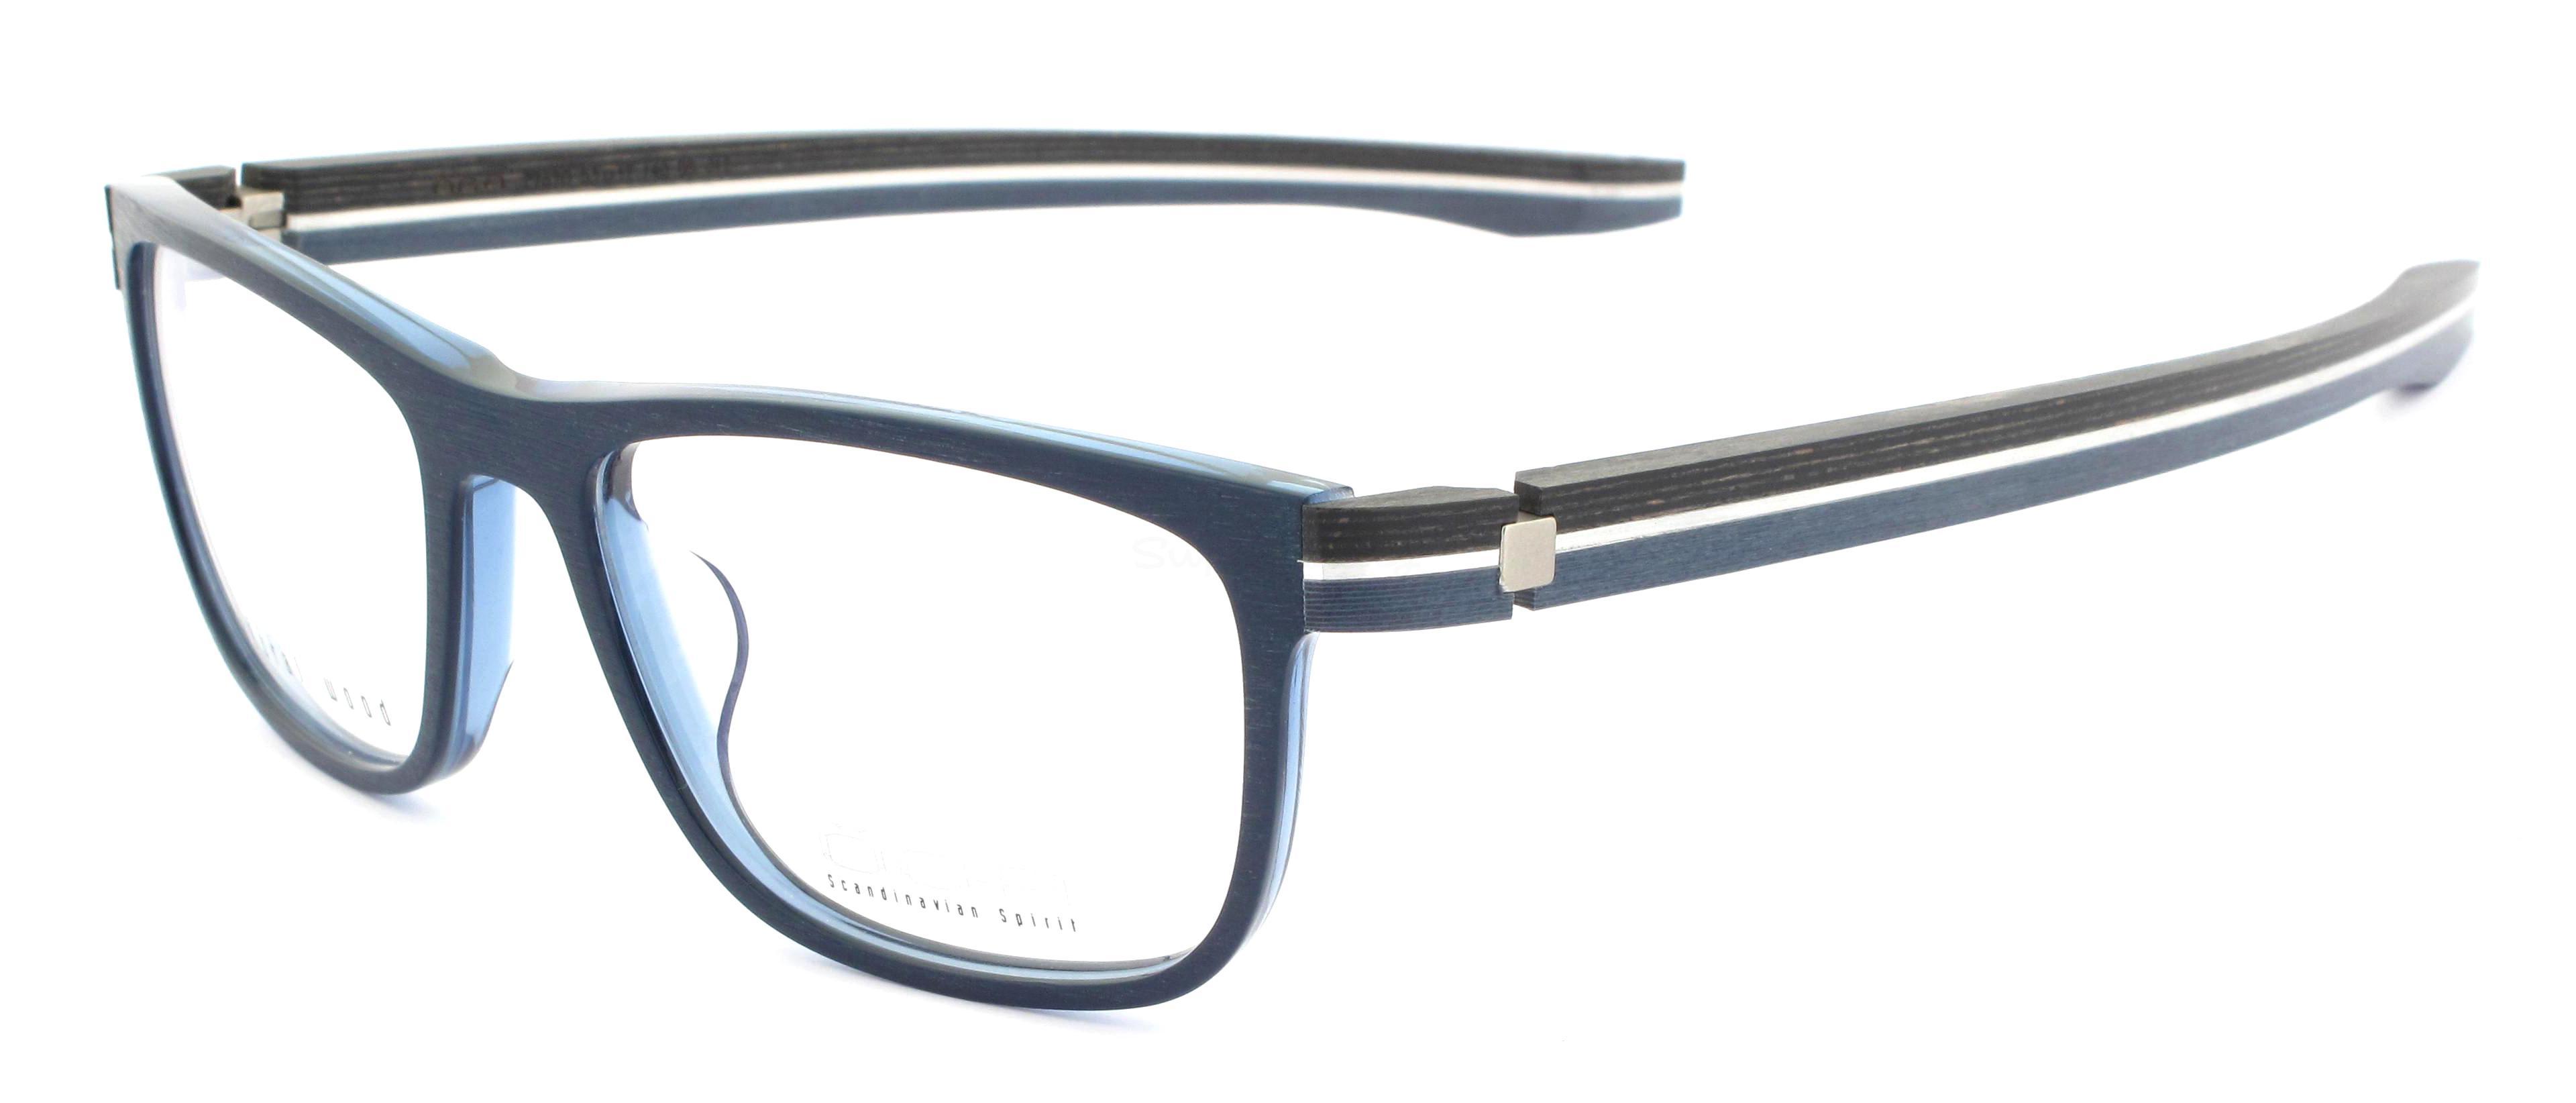 BB012 7787O PILTRA (WOOD) Glasses, ÖGA Scandinavian Spirit